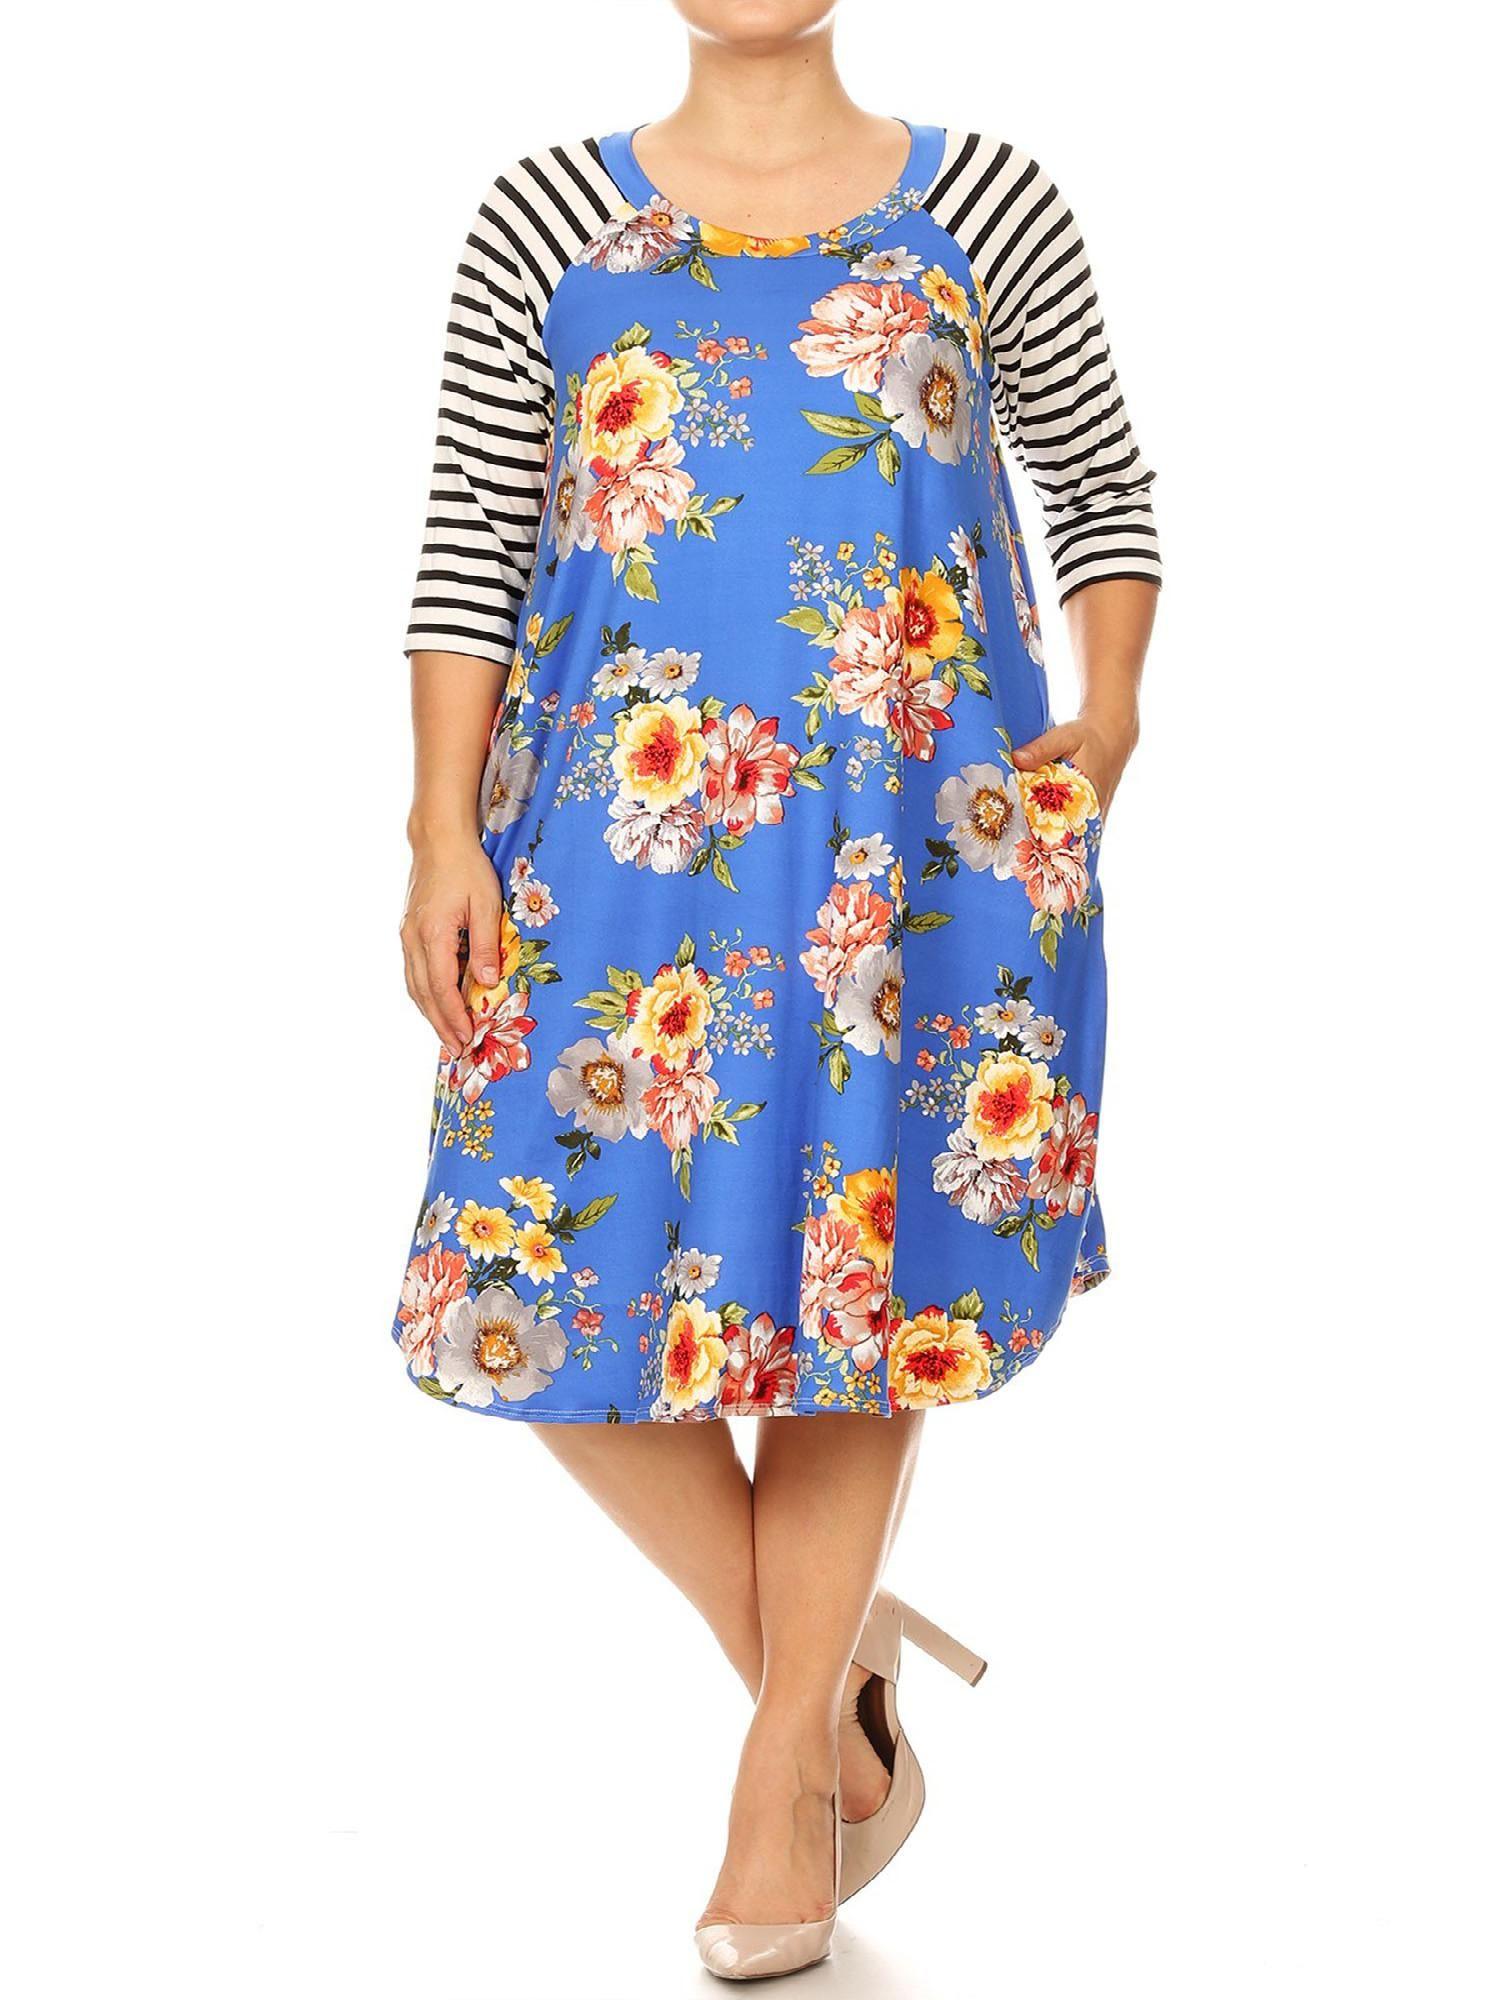 Moa Collection Women S Casual Pattern Print Plus Size Striped Loose Fit Pockets Midi Dress Made In Usa Ad Pattern Affilia Casual Women Dress Making Dresses [ 2000 x 1500 Pixel ]